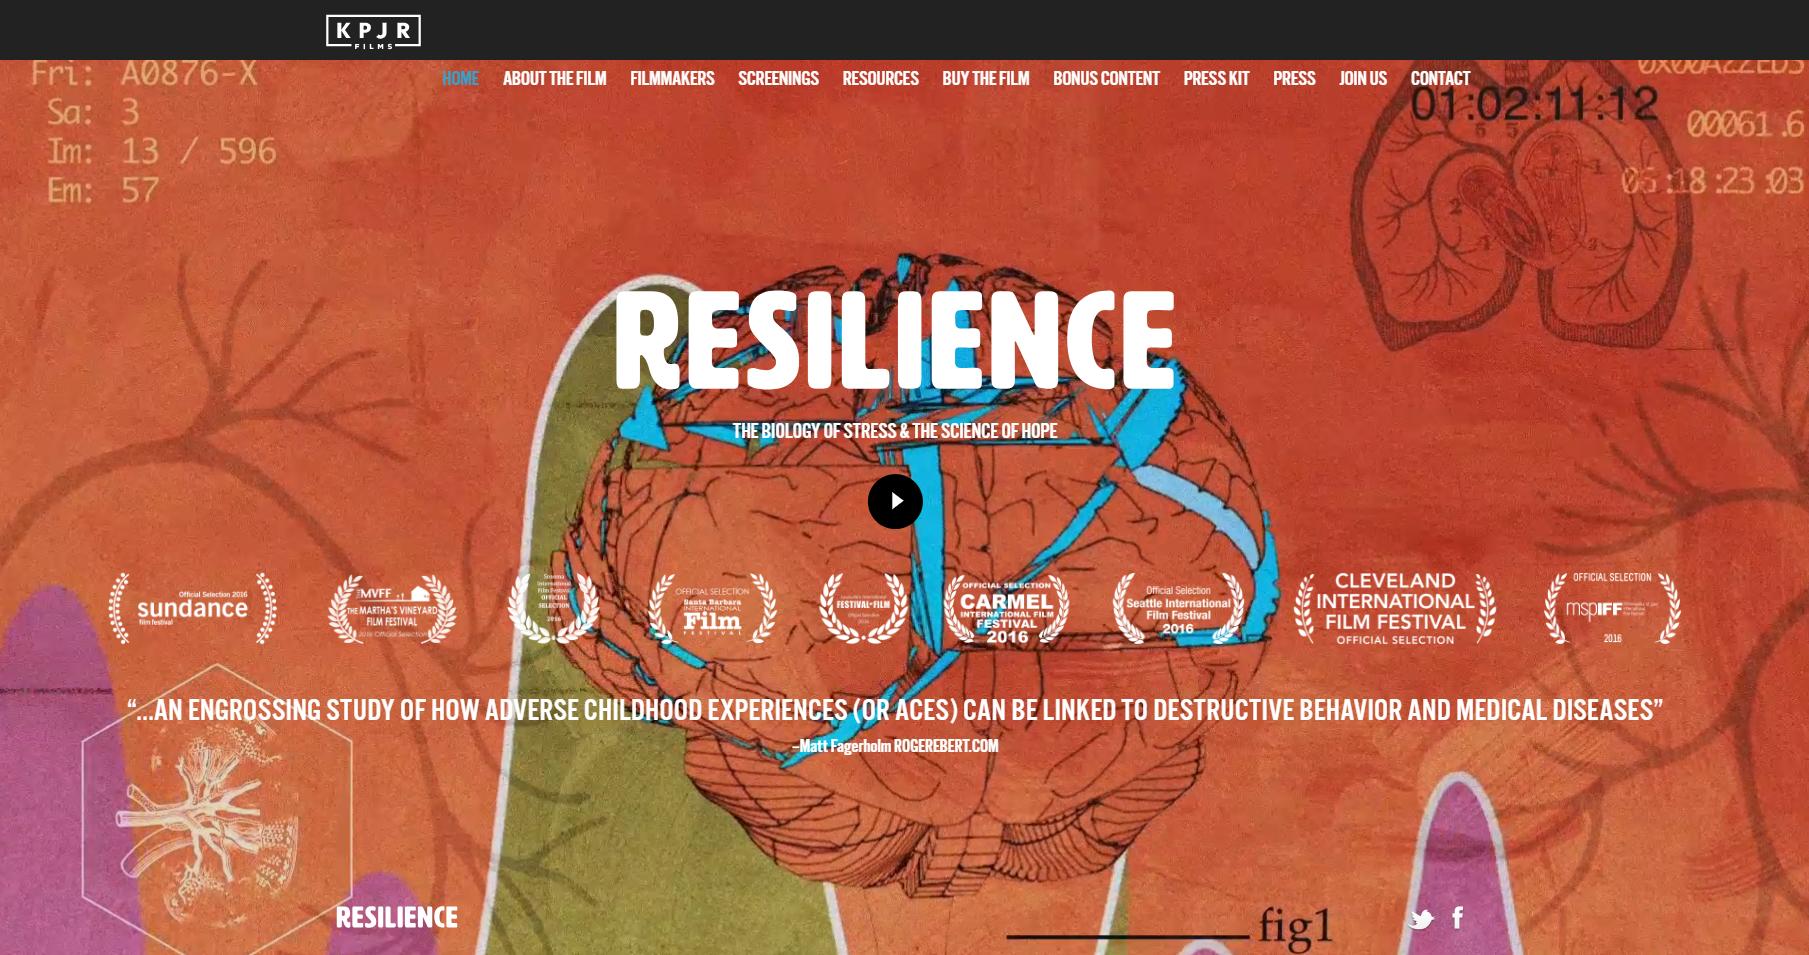 resilienceECIN.png